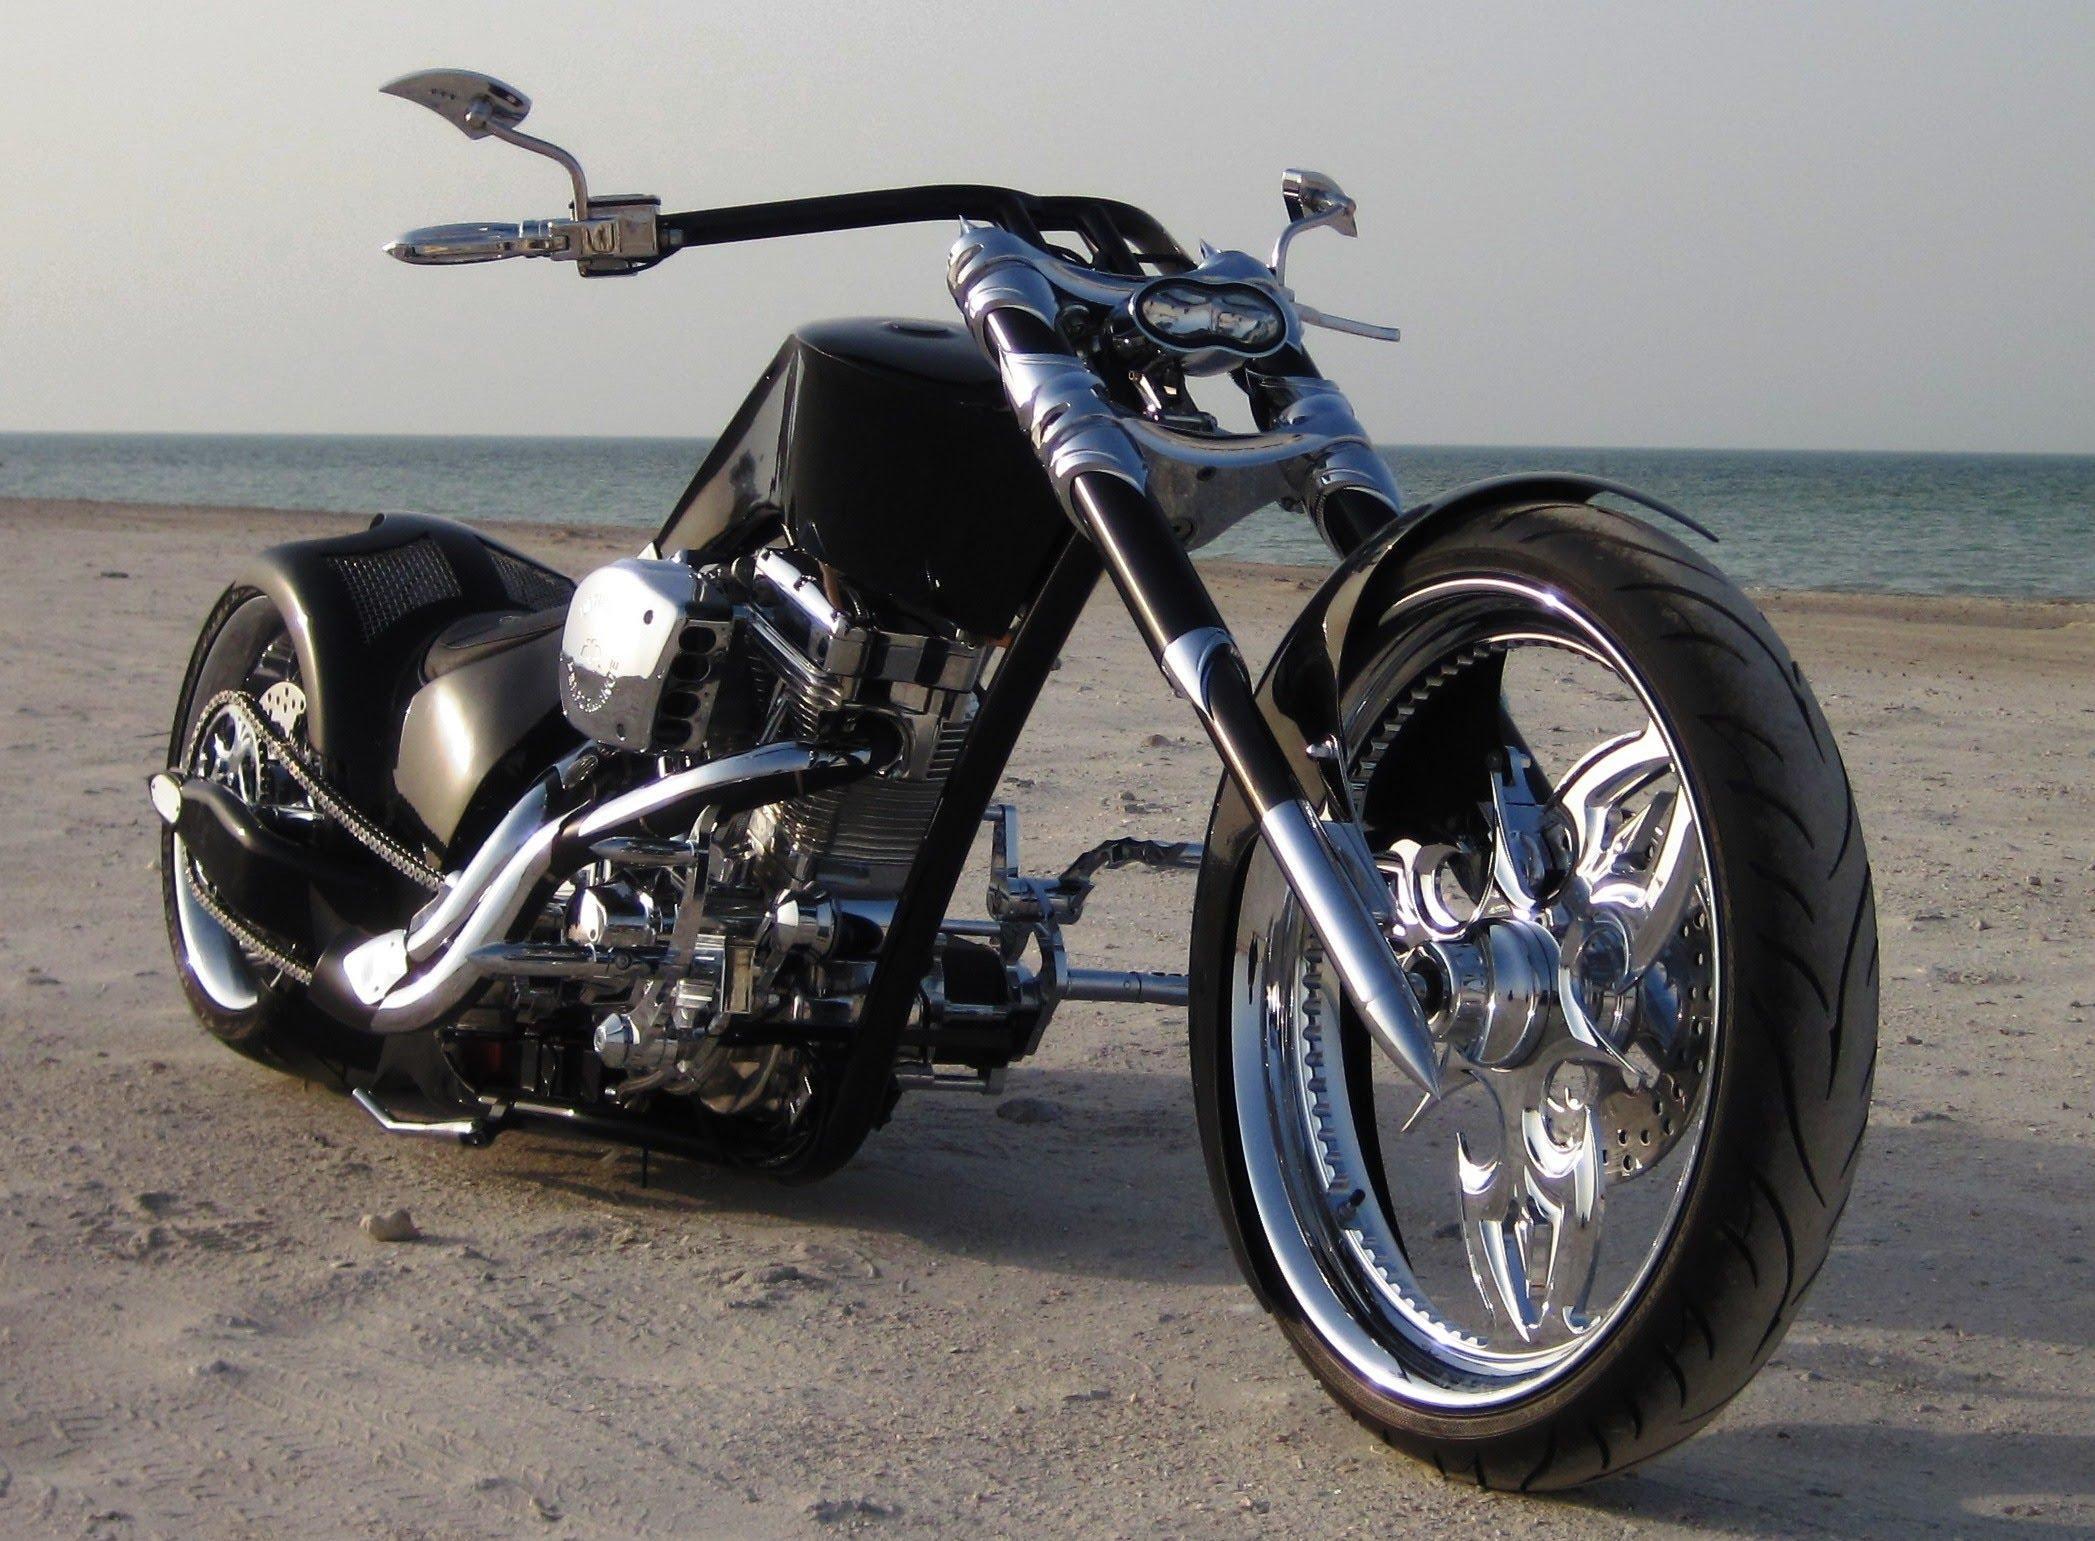 CUSTOM CHOPPER motorbike tuning bike hot rod rods e ...